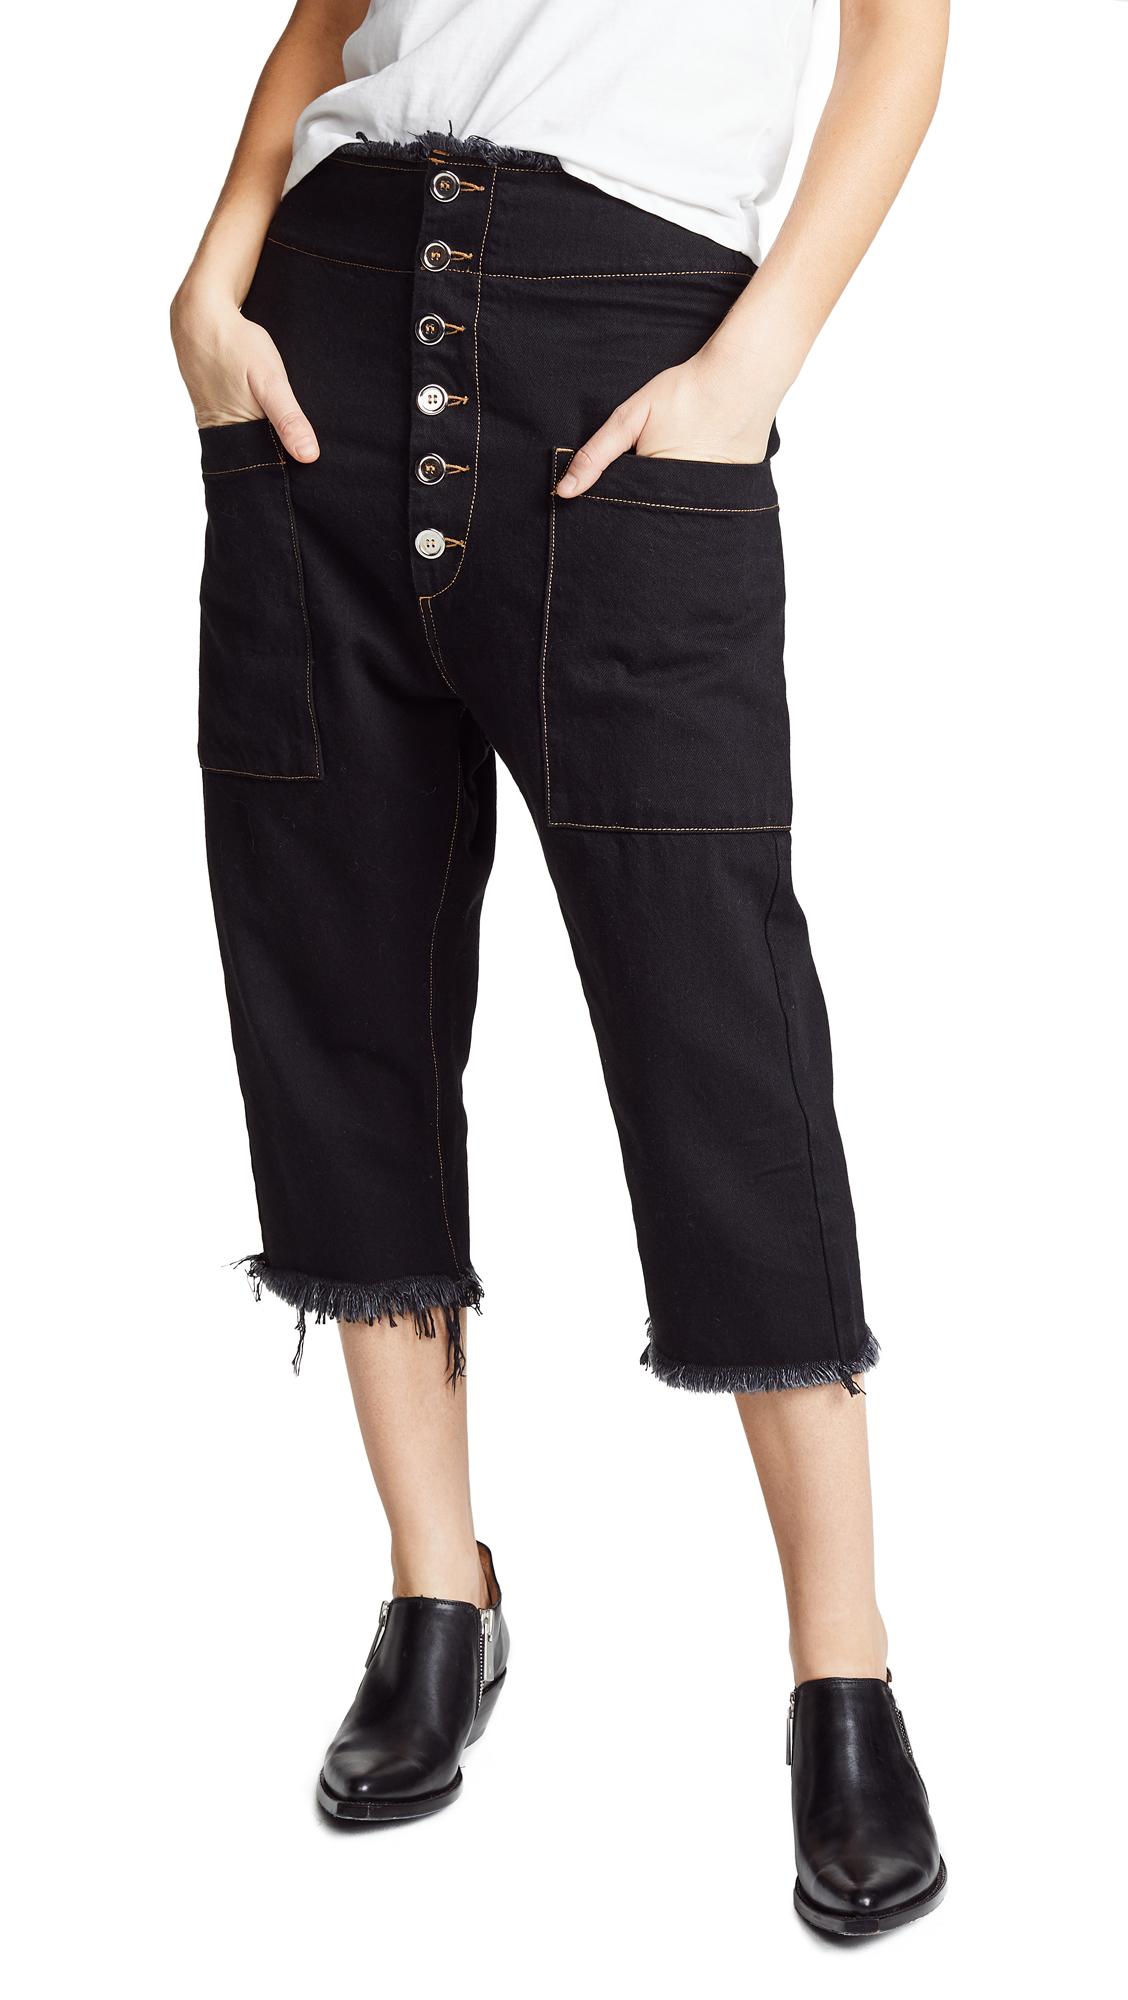 Marques Almeida Drop Crotch Trousers In Black